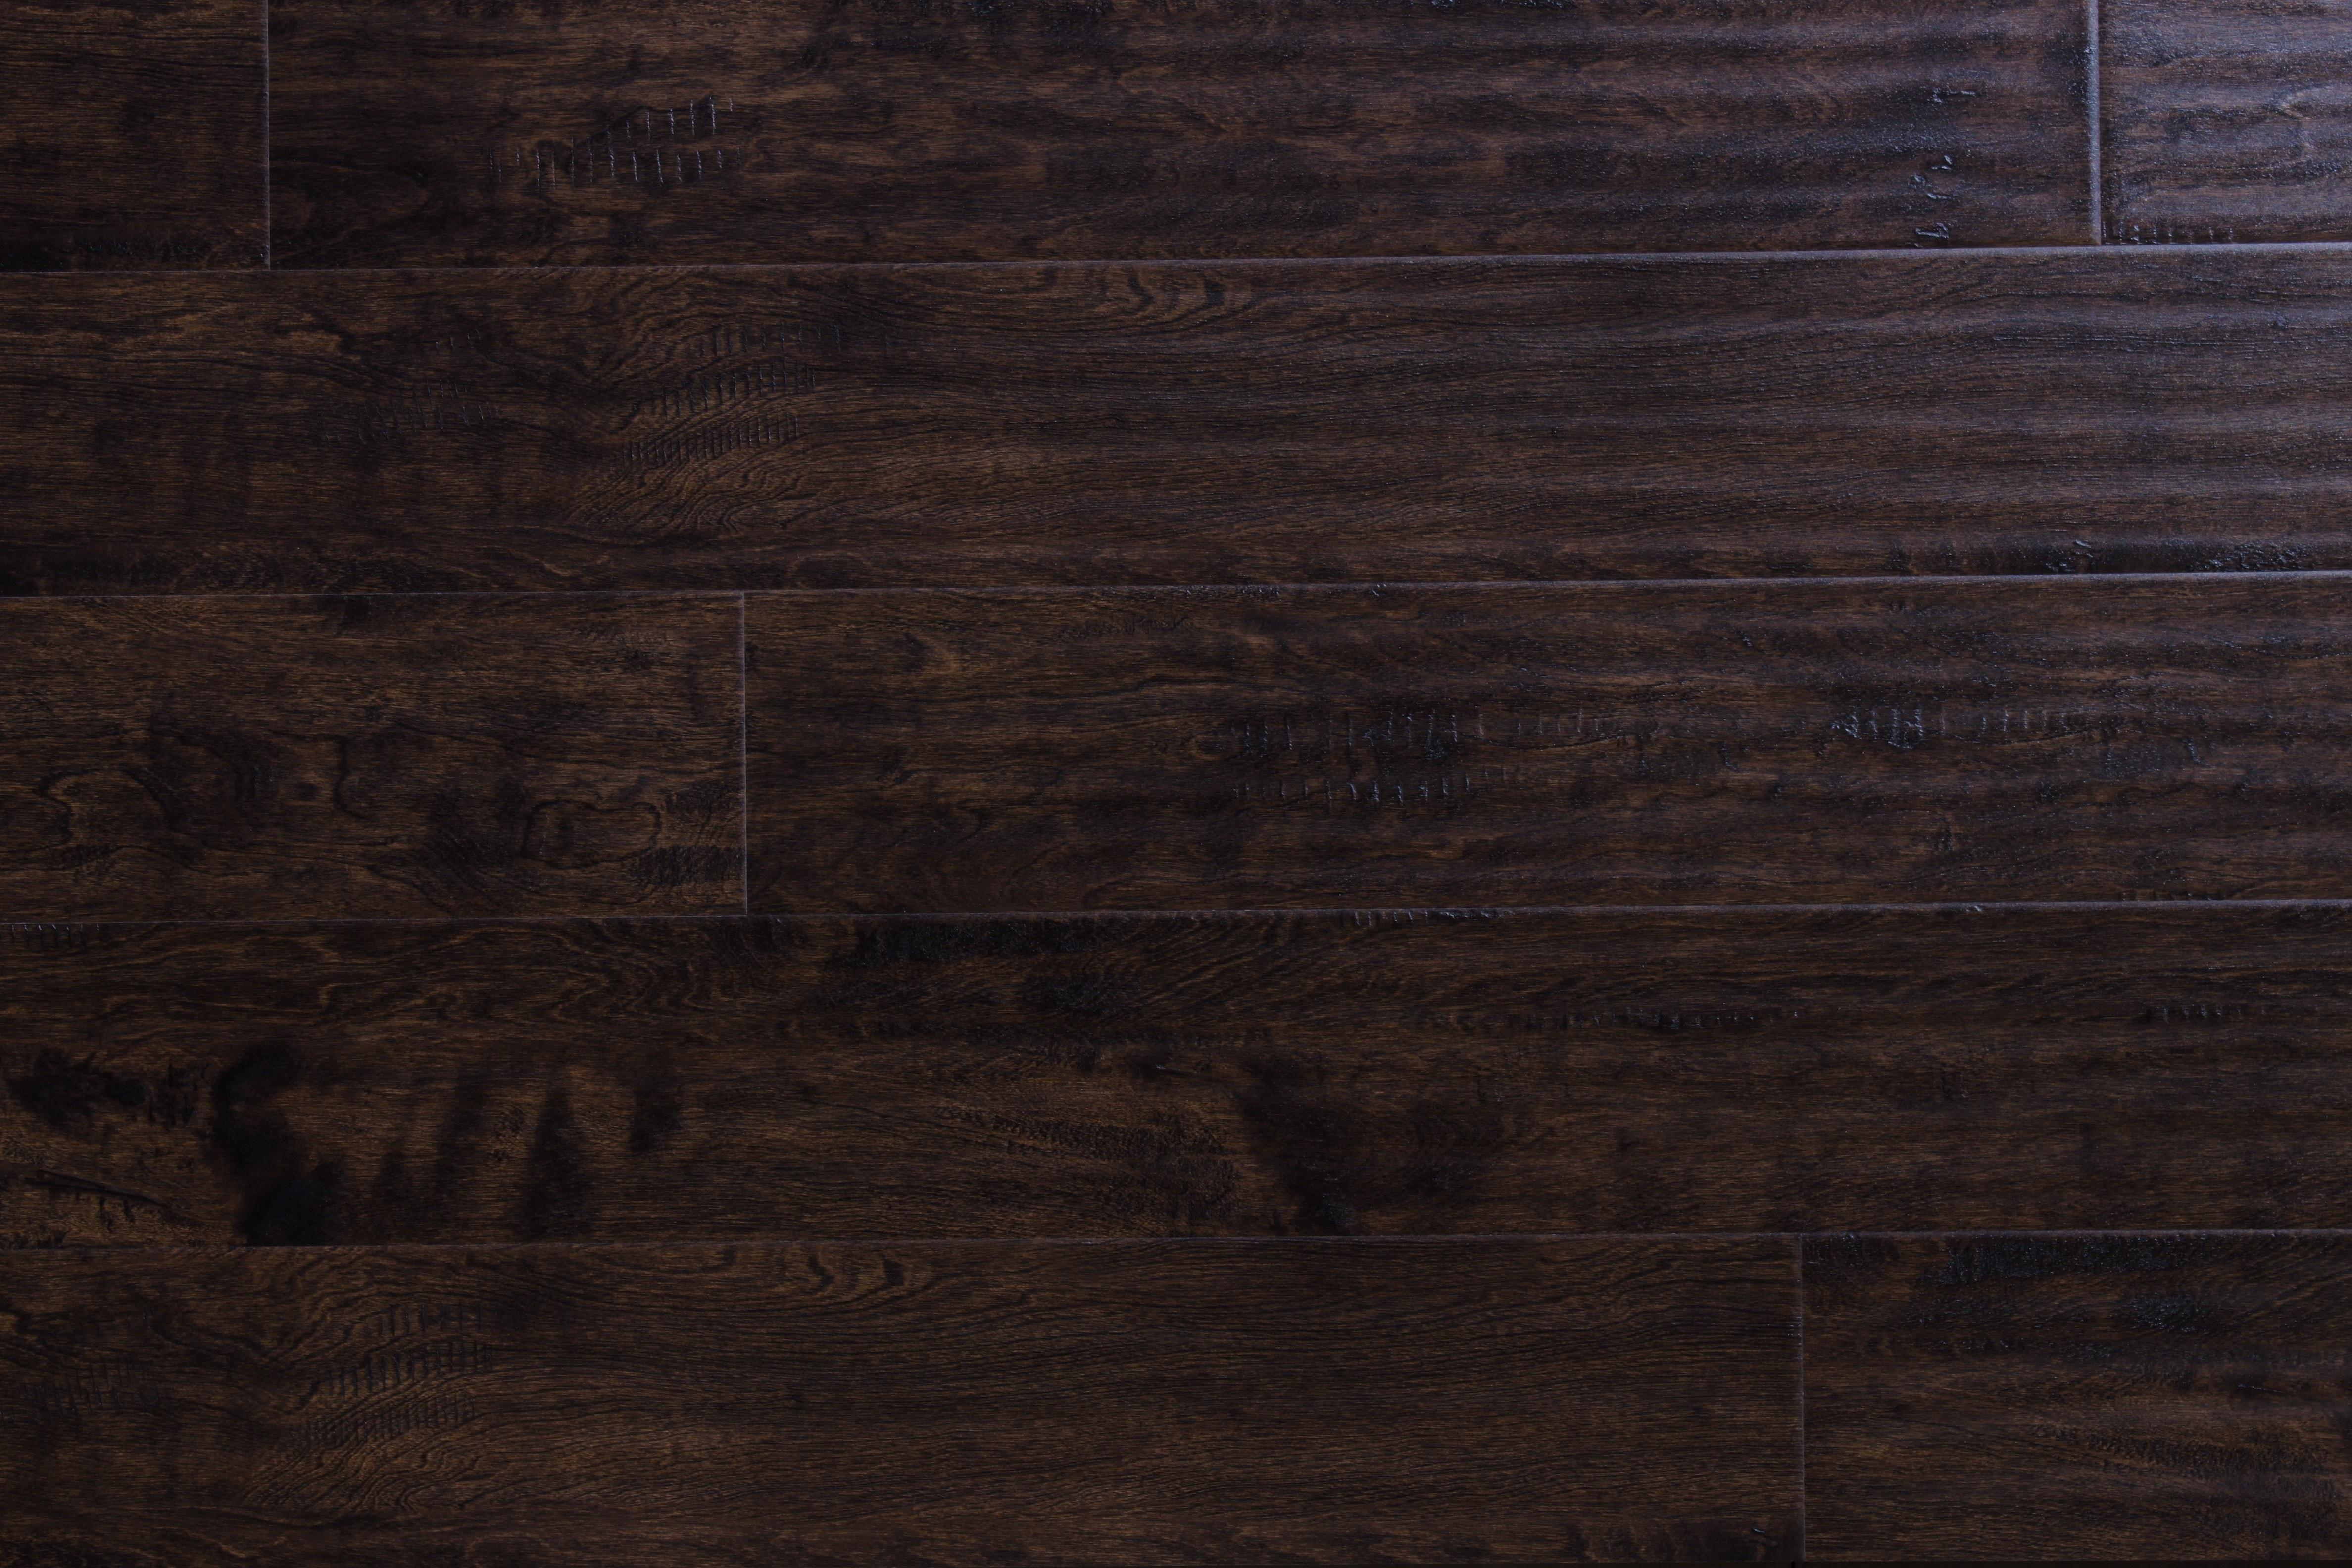 reward hardwood flooring reviews of wood flooring free samples available at builddirecta in tailor multi gb 5874277bb8d3c